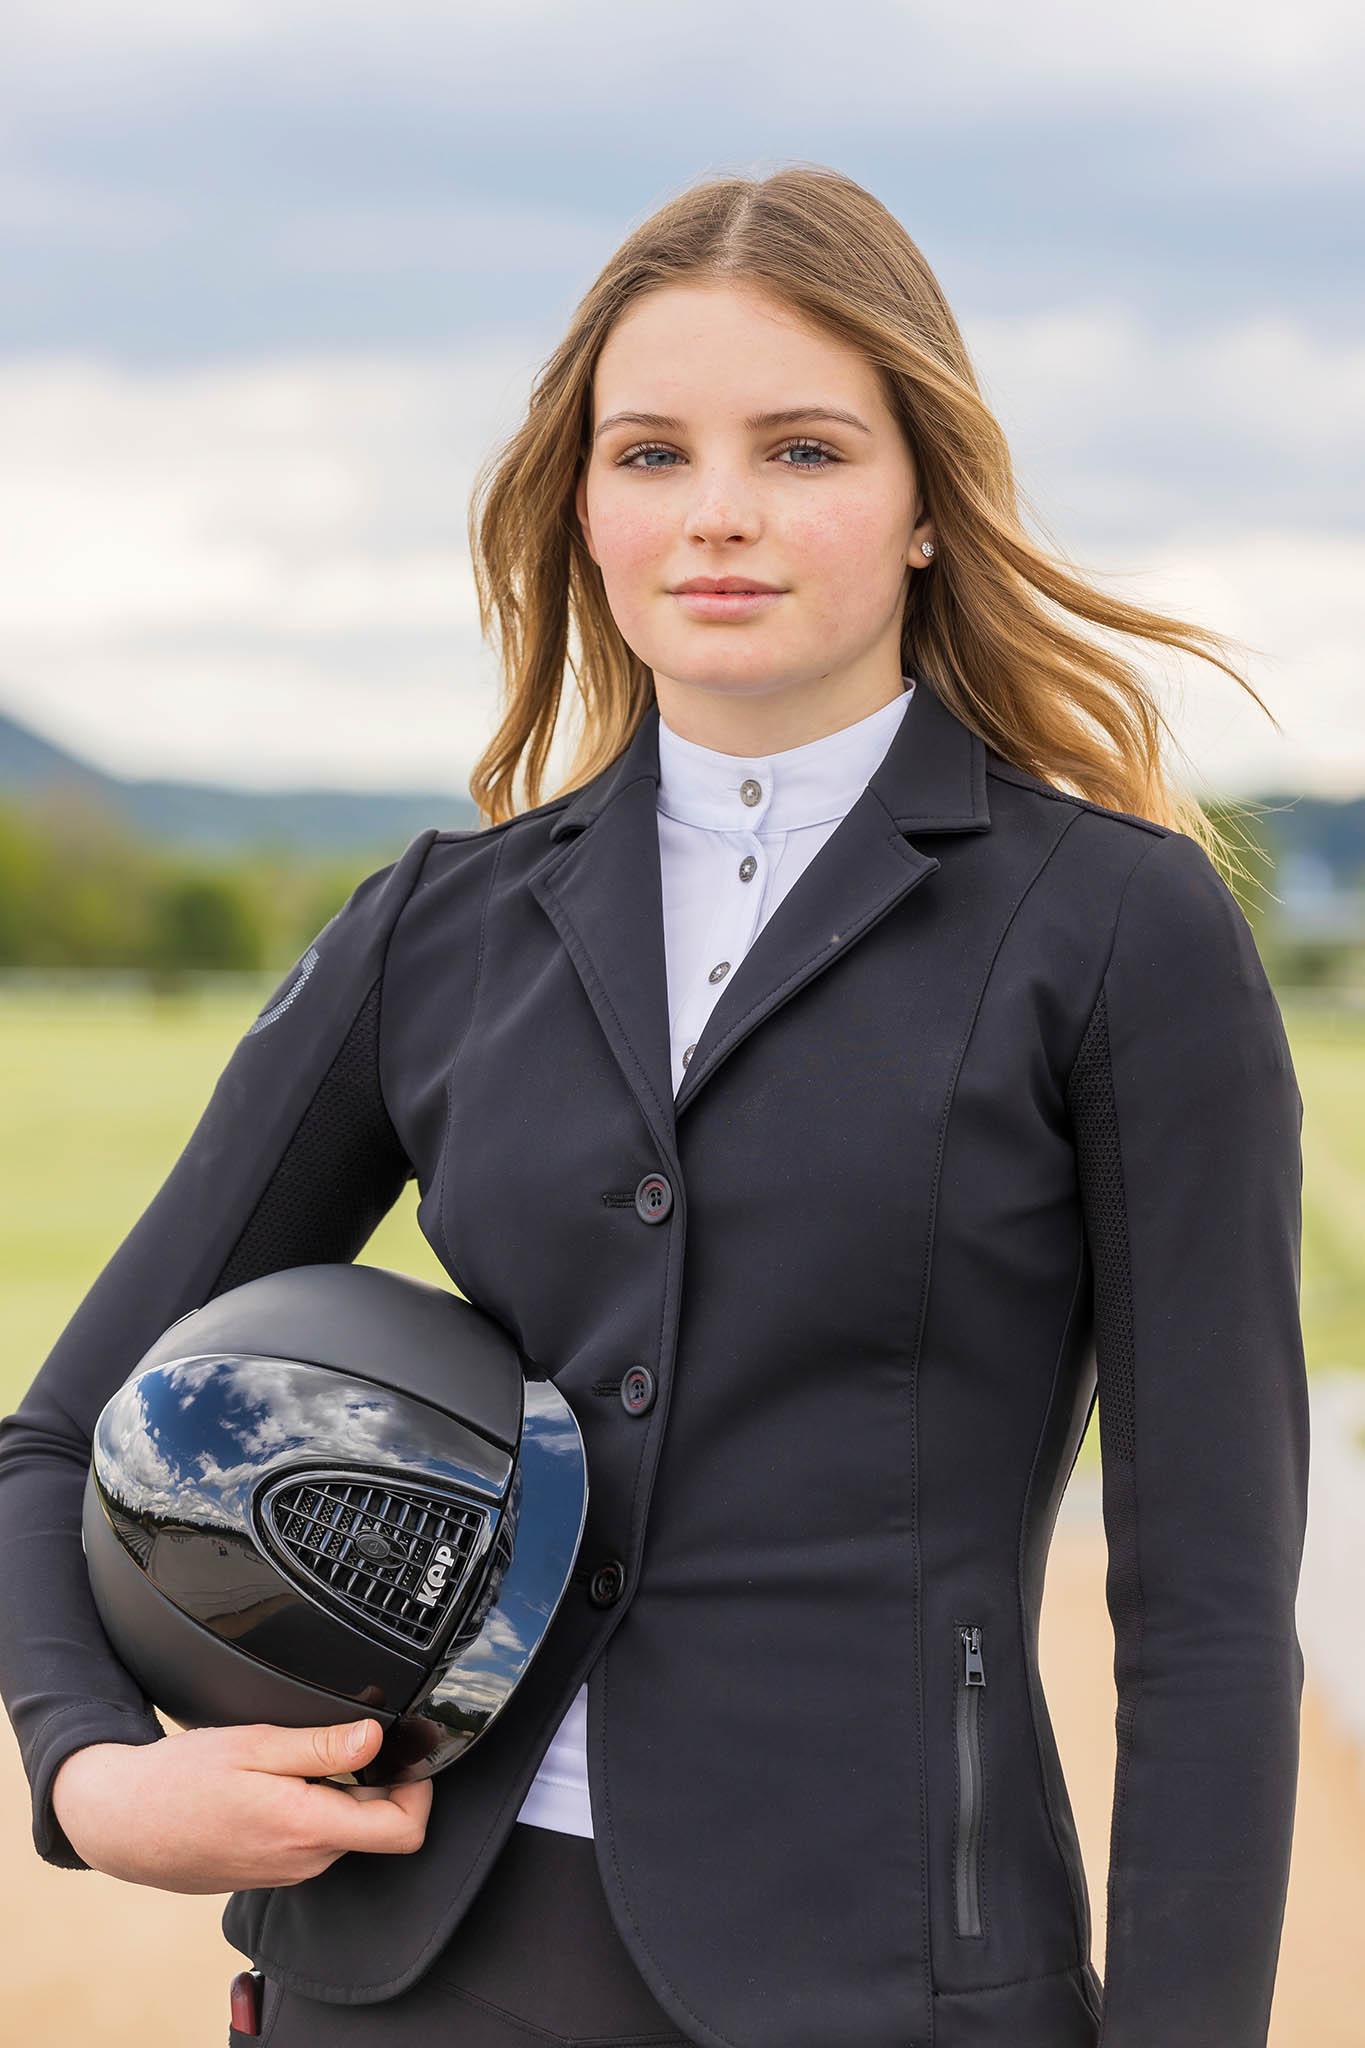 Mladá naděje parkurového sportu: na snímku Anna Marie. Dcera druhého nejbohatšího Čecha Radovana Vítka.